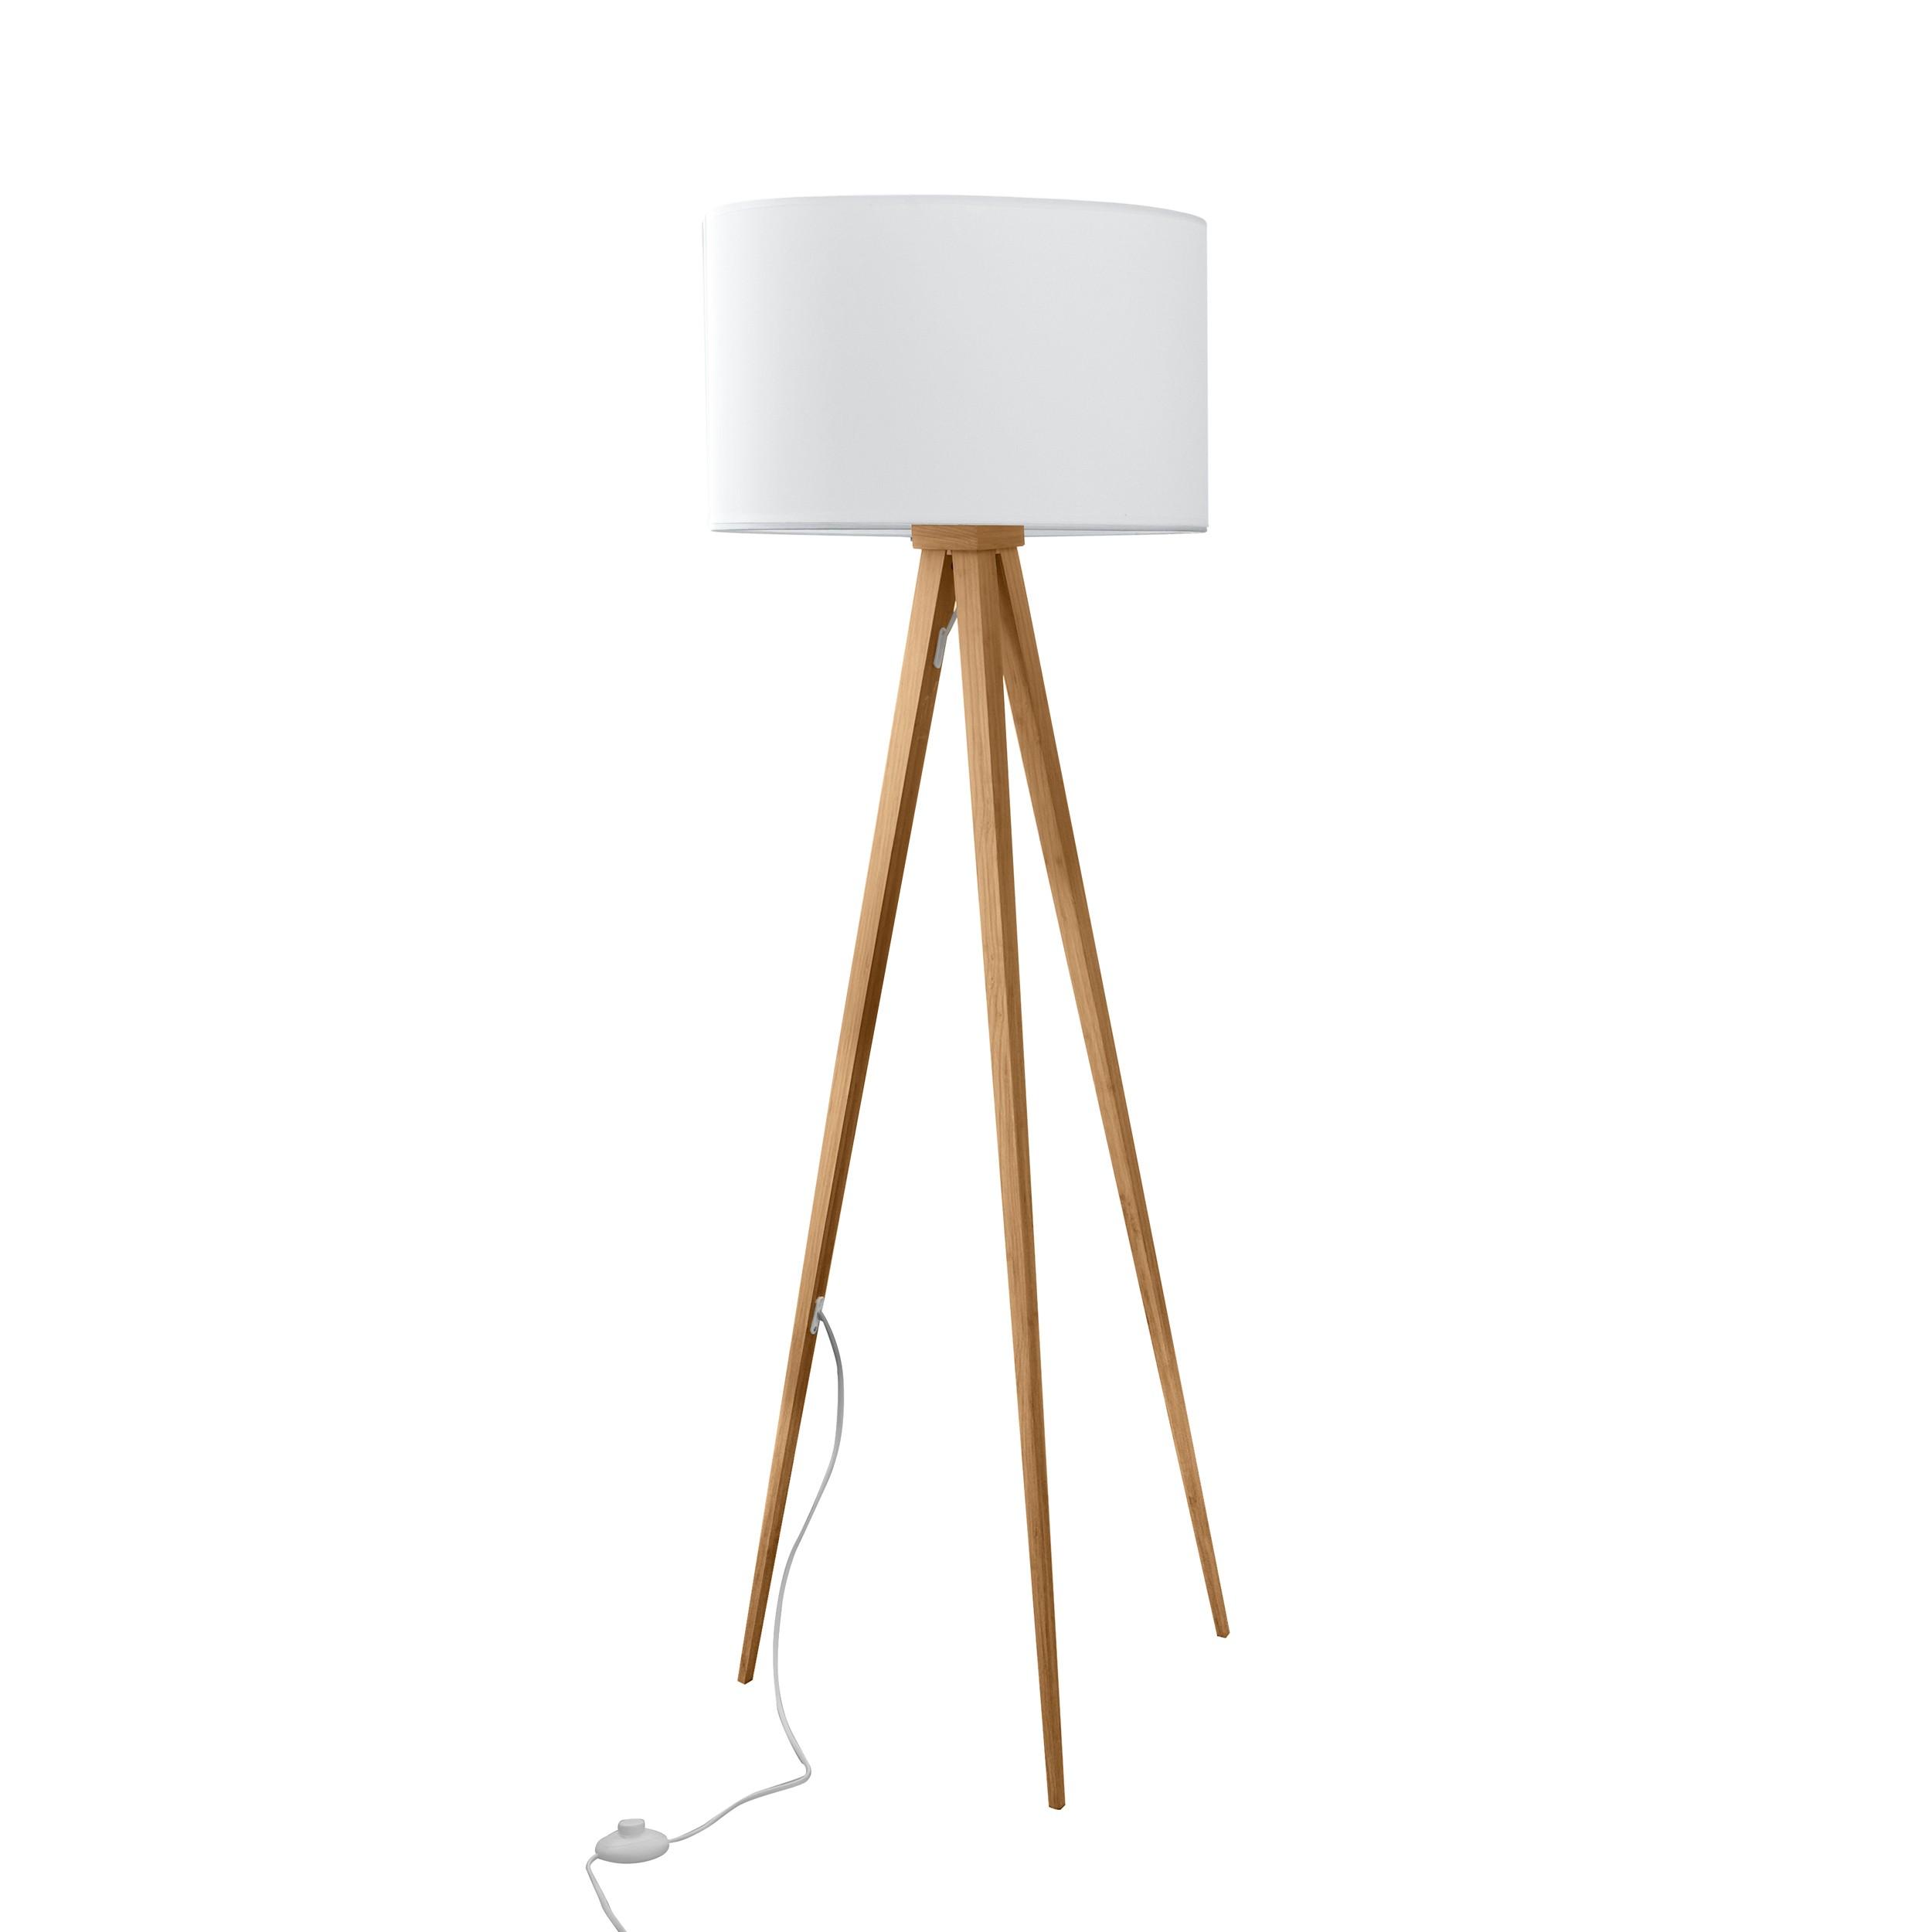 lampadaire tr pied bicolore blanc illuminez vos pi ces avec nos lampadaires tr pied bicolores. Black Bedroom Furniture Sets. Home Design Ideas